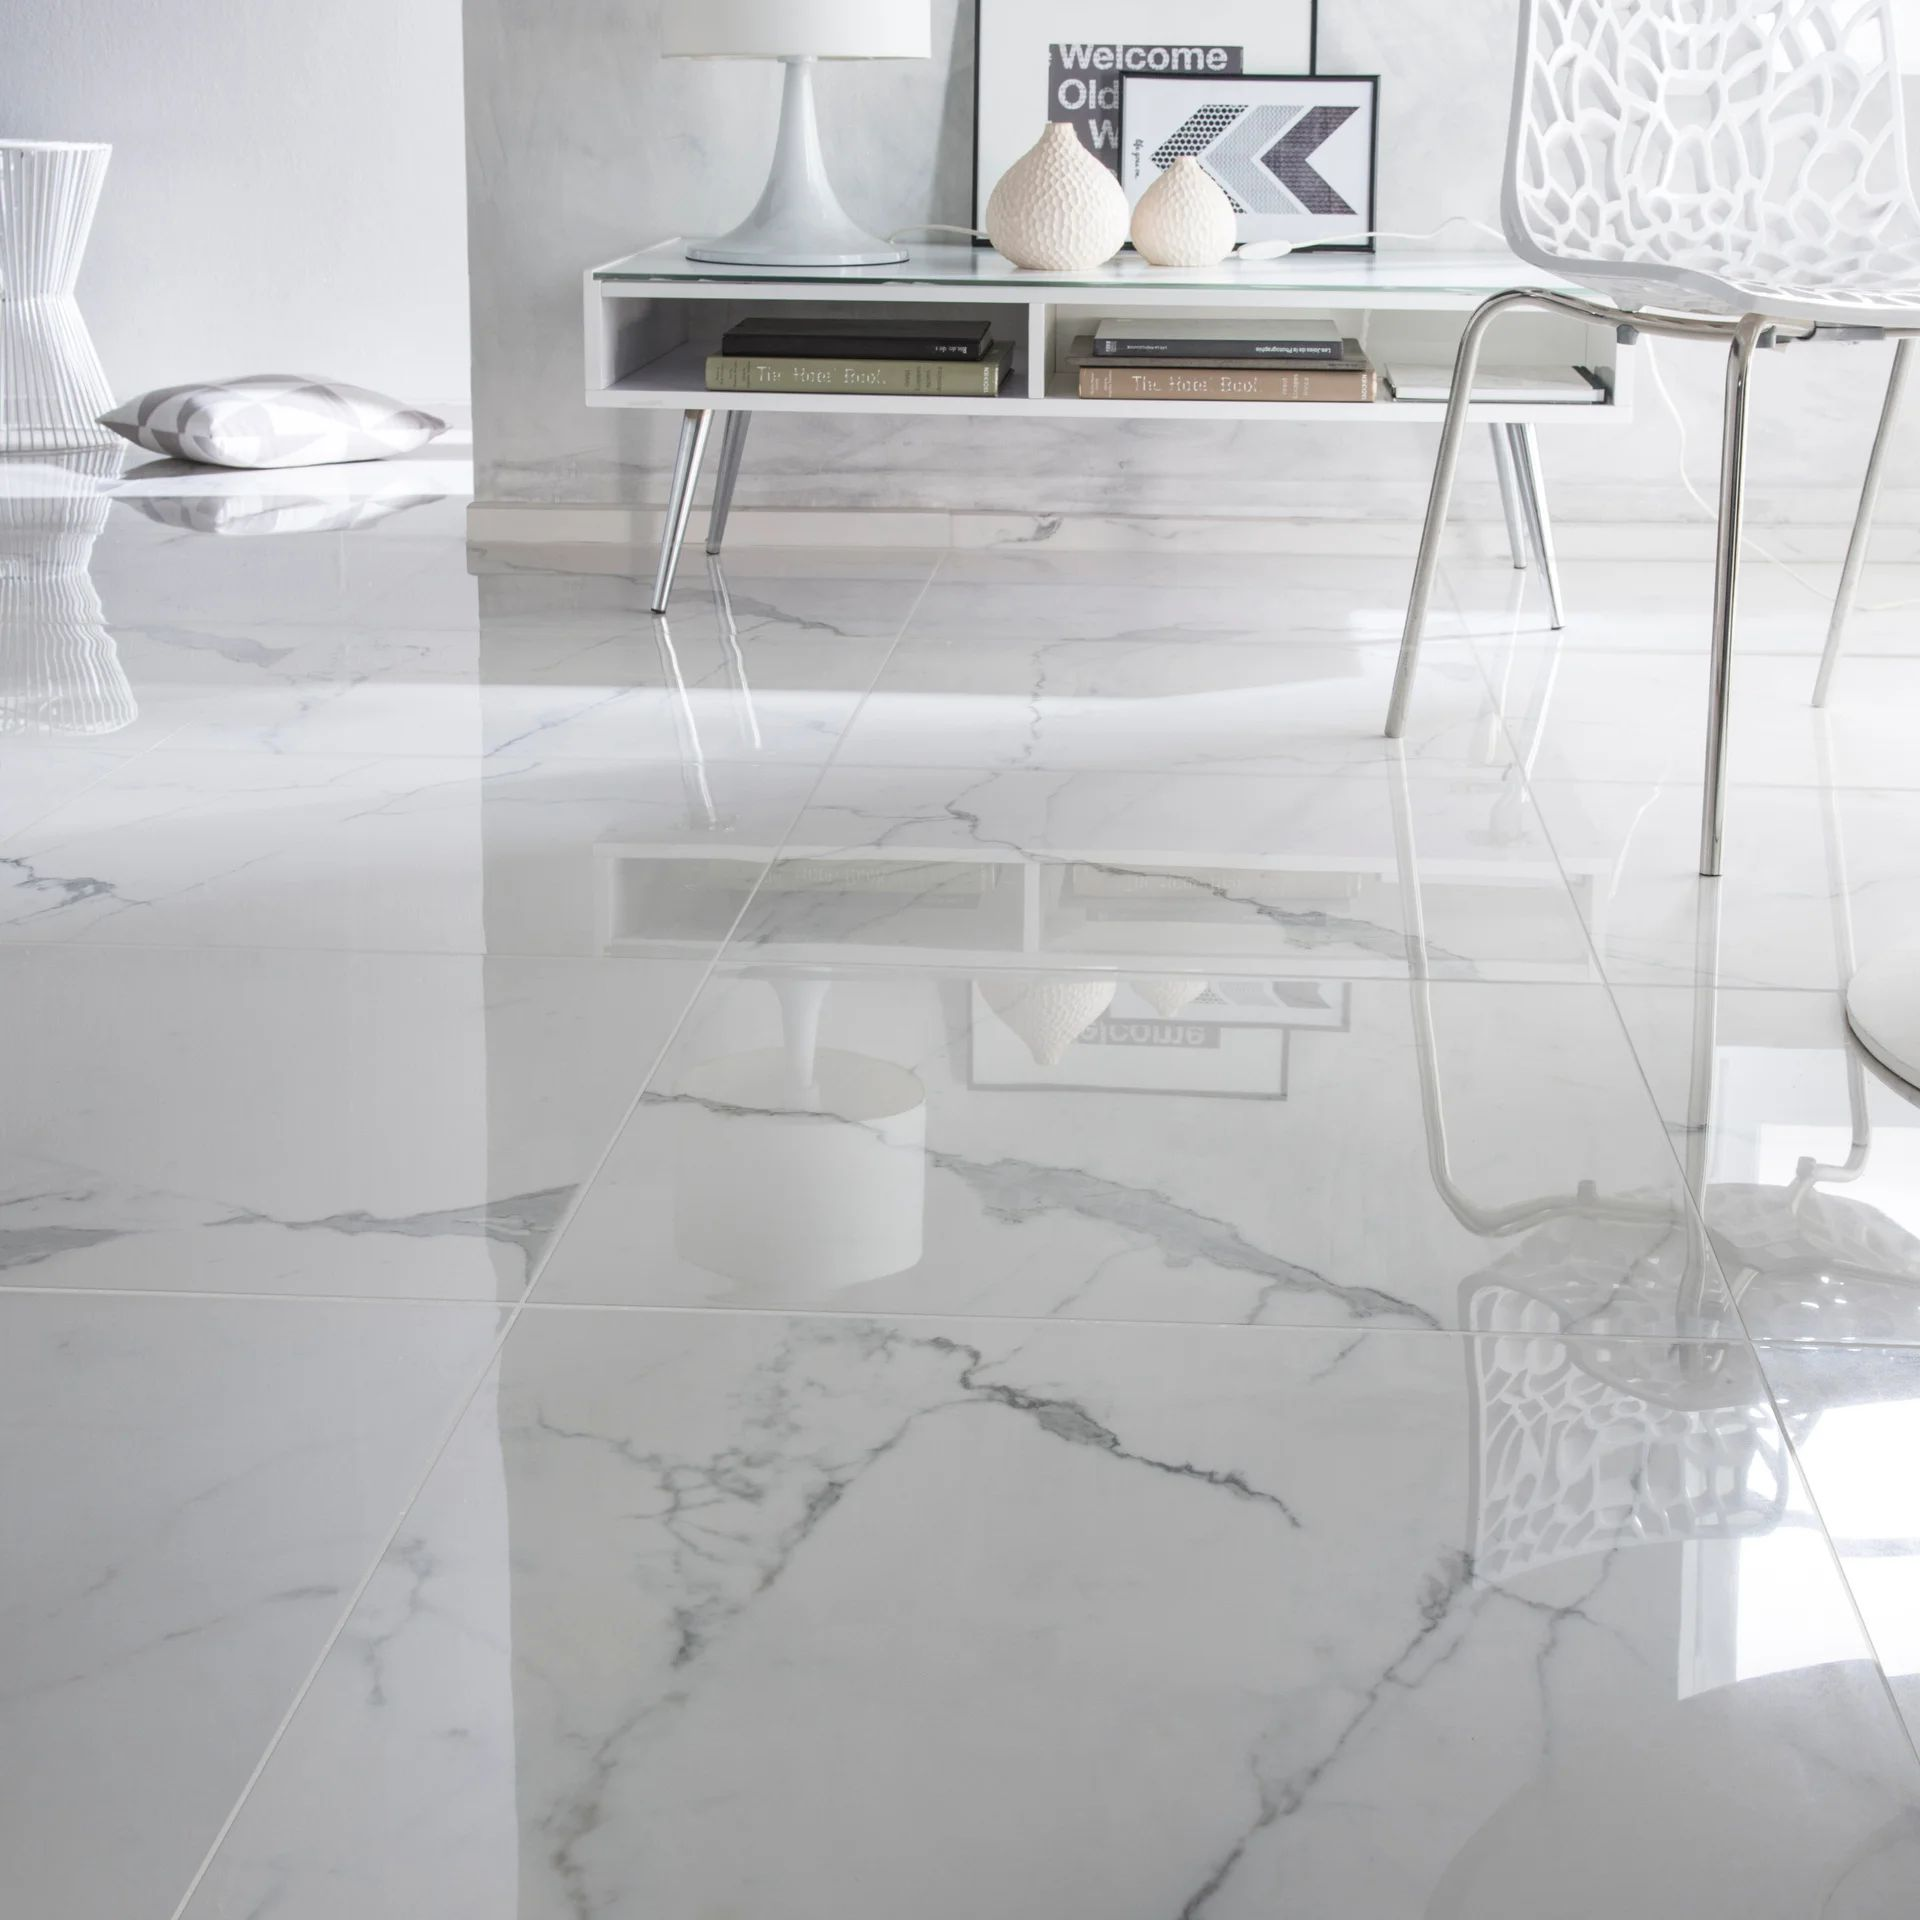 carrelage sol et mur intenso effet marbre blanc rimini l 60 x l 60 cm